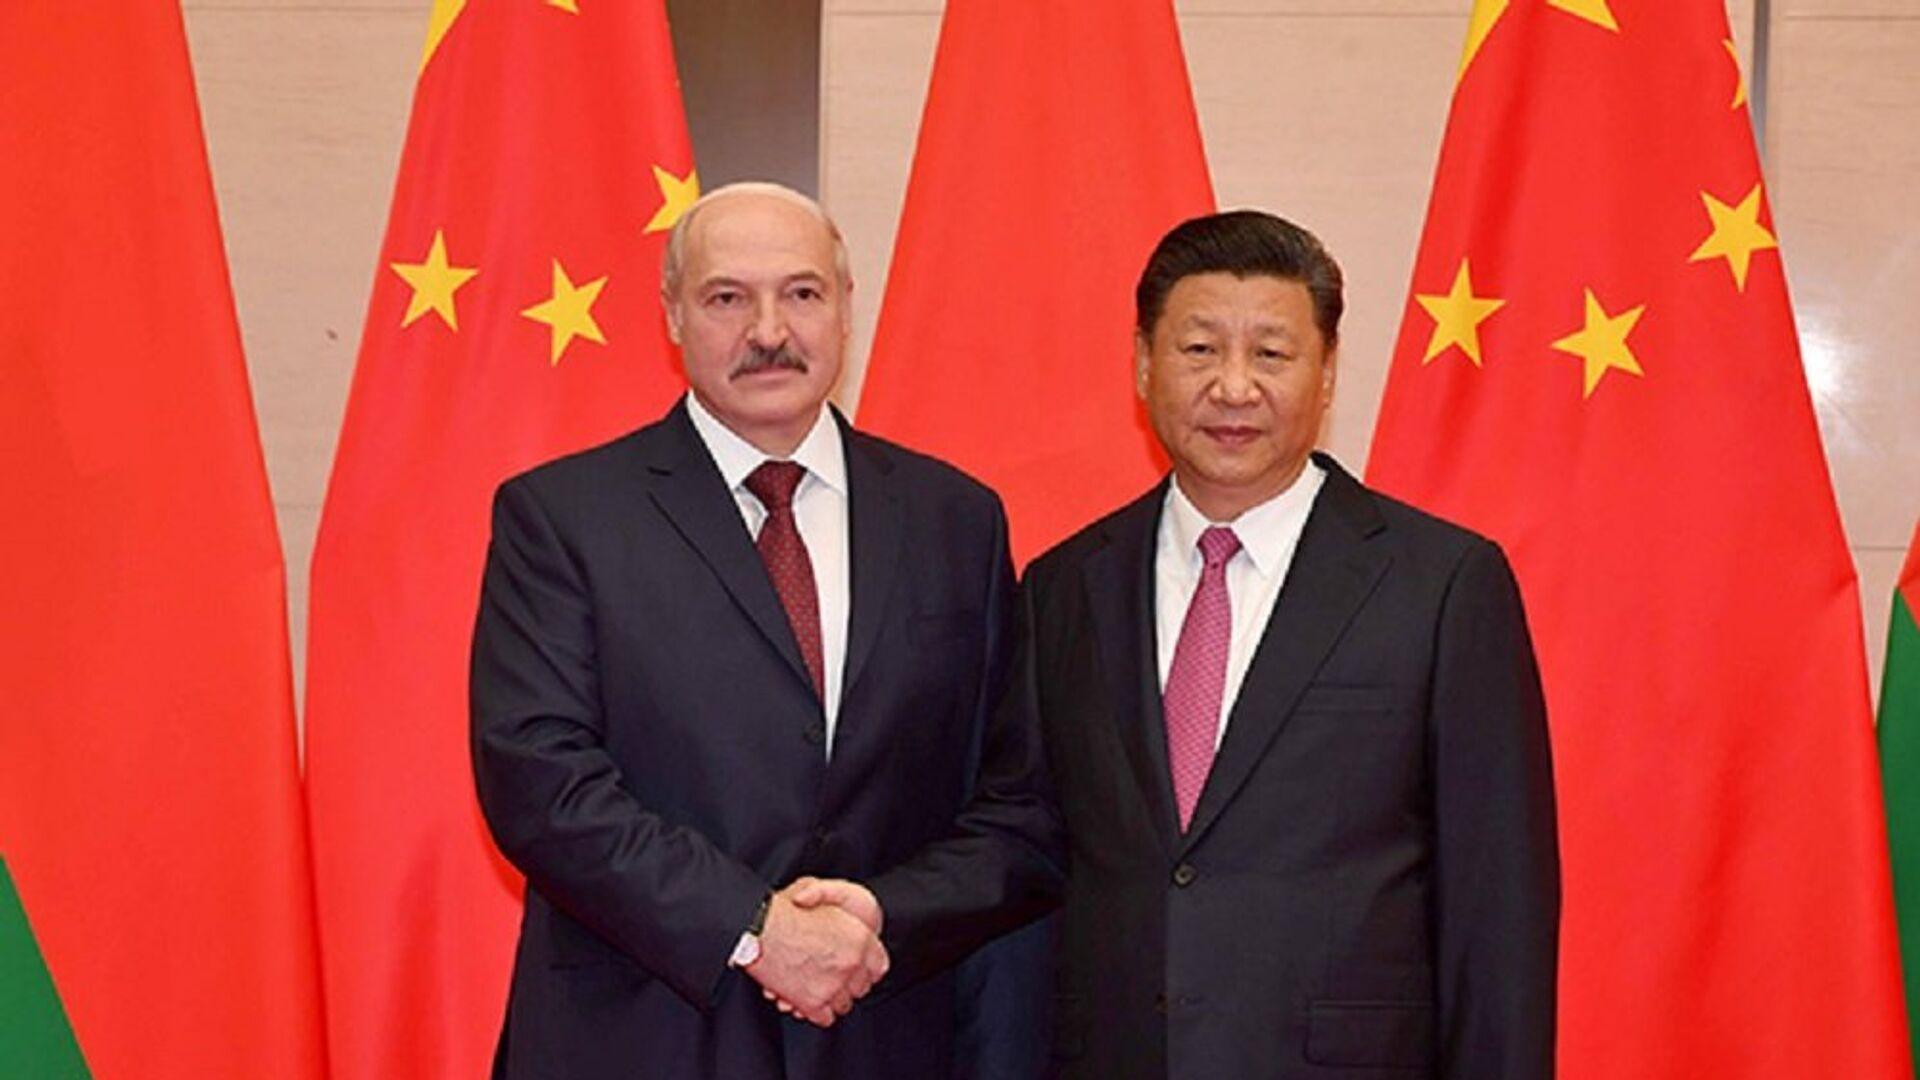 Президент Беларуси Александр Лукашенко и председатель КНР Си Цзиньпин - Sputnik Беларусь, 1920, 01.10.2021